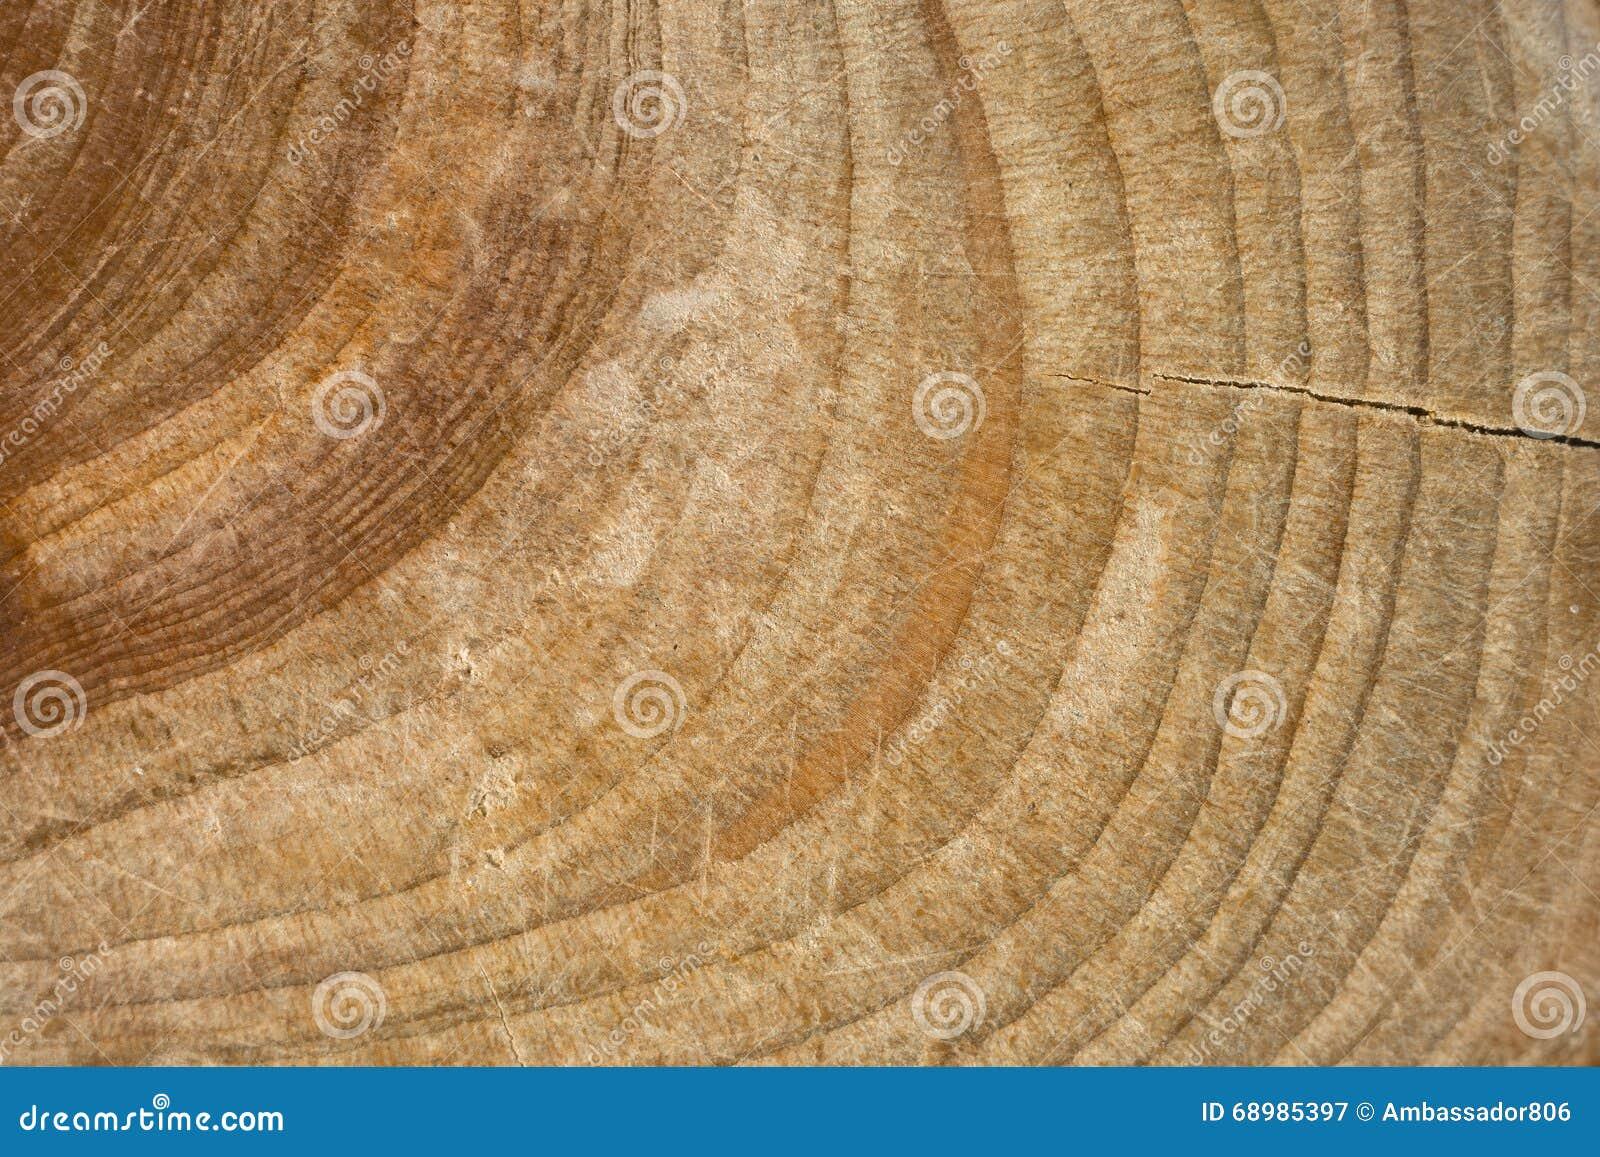 Textura de madera del tocón, tronco de árbol cutted